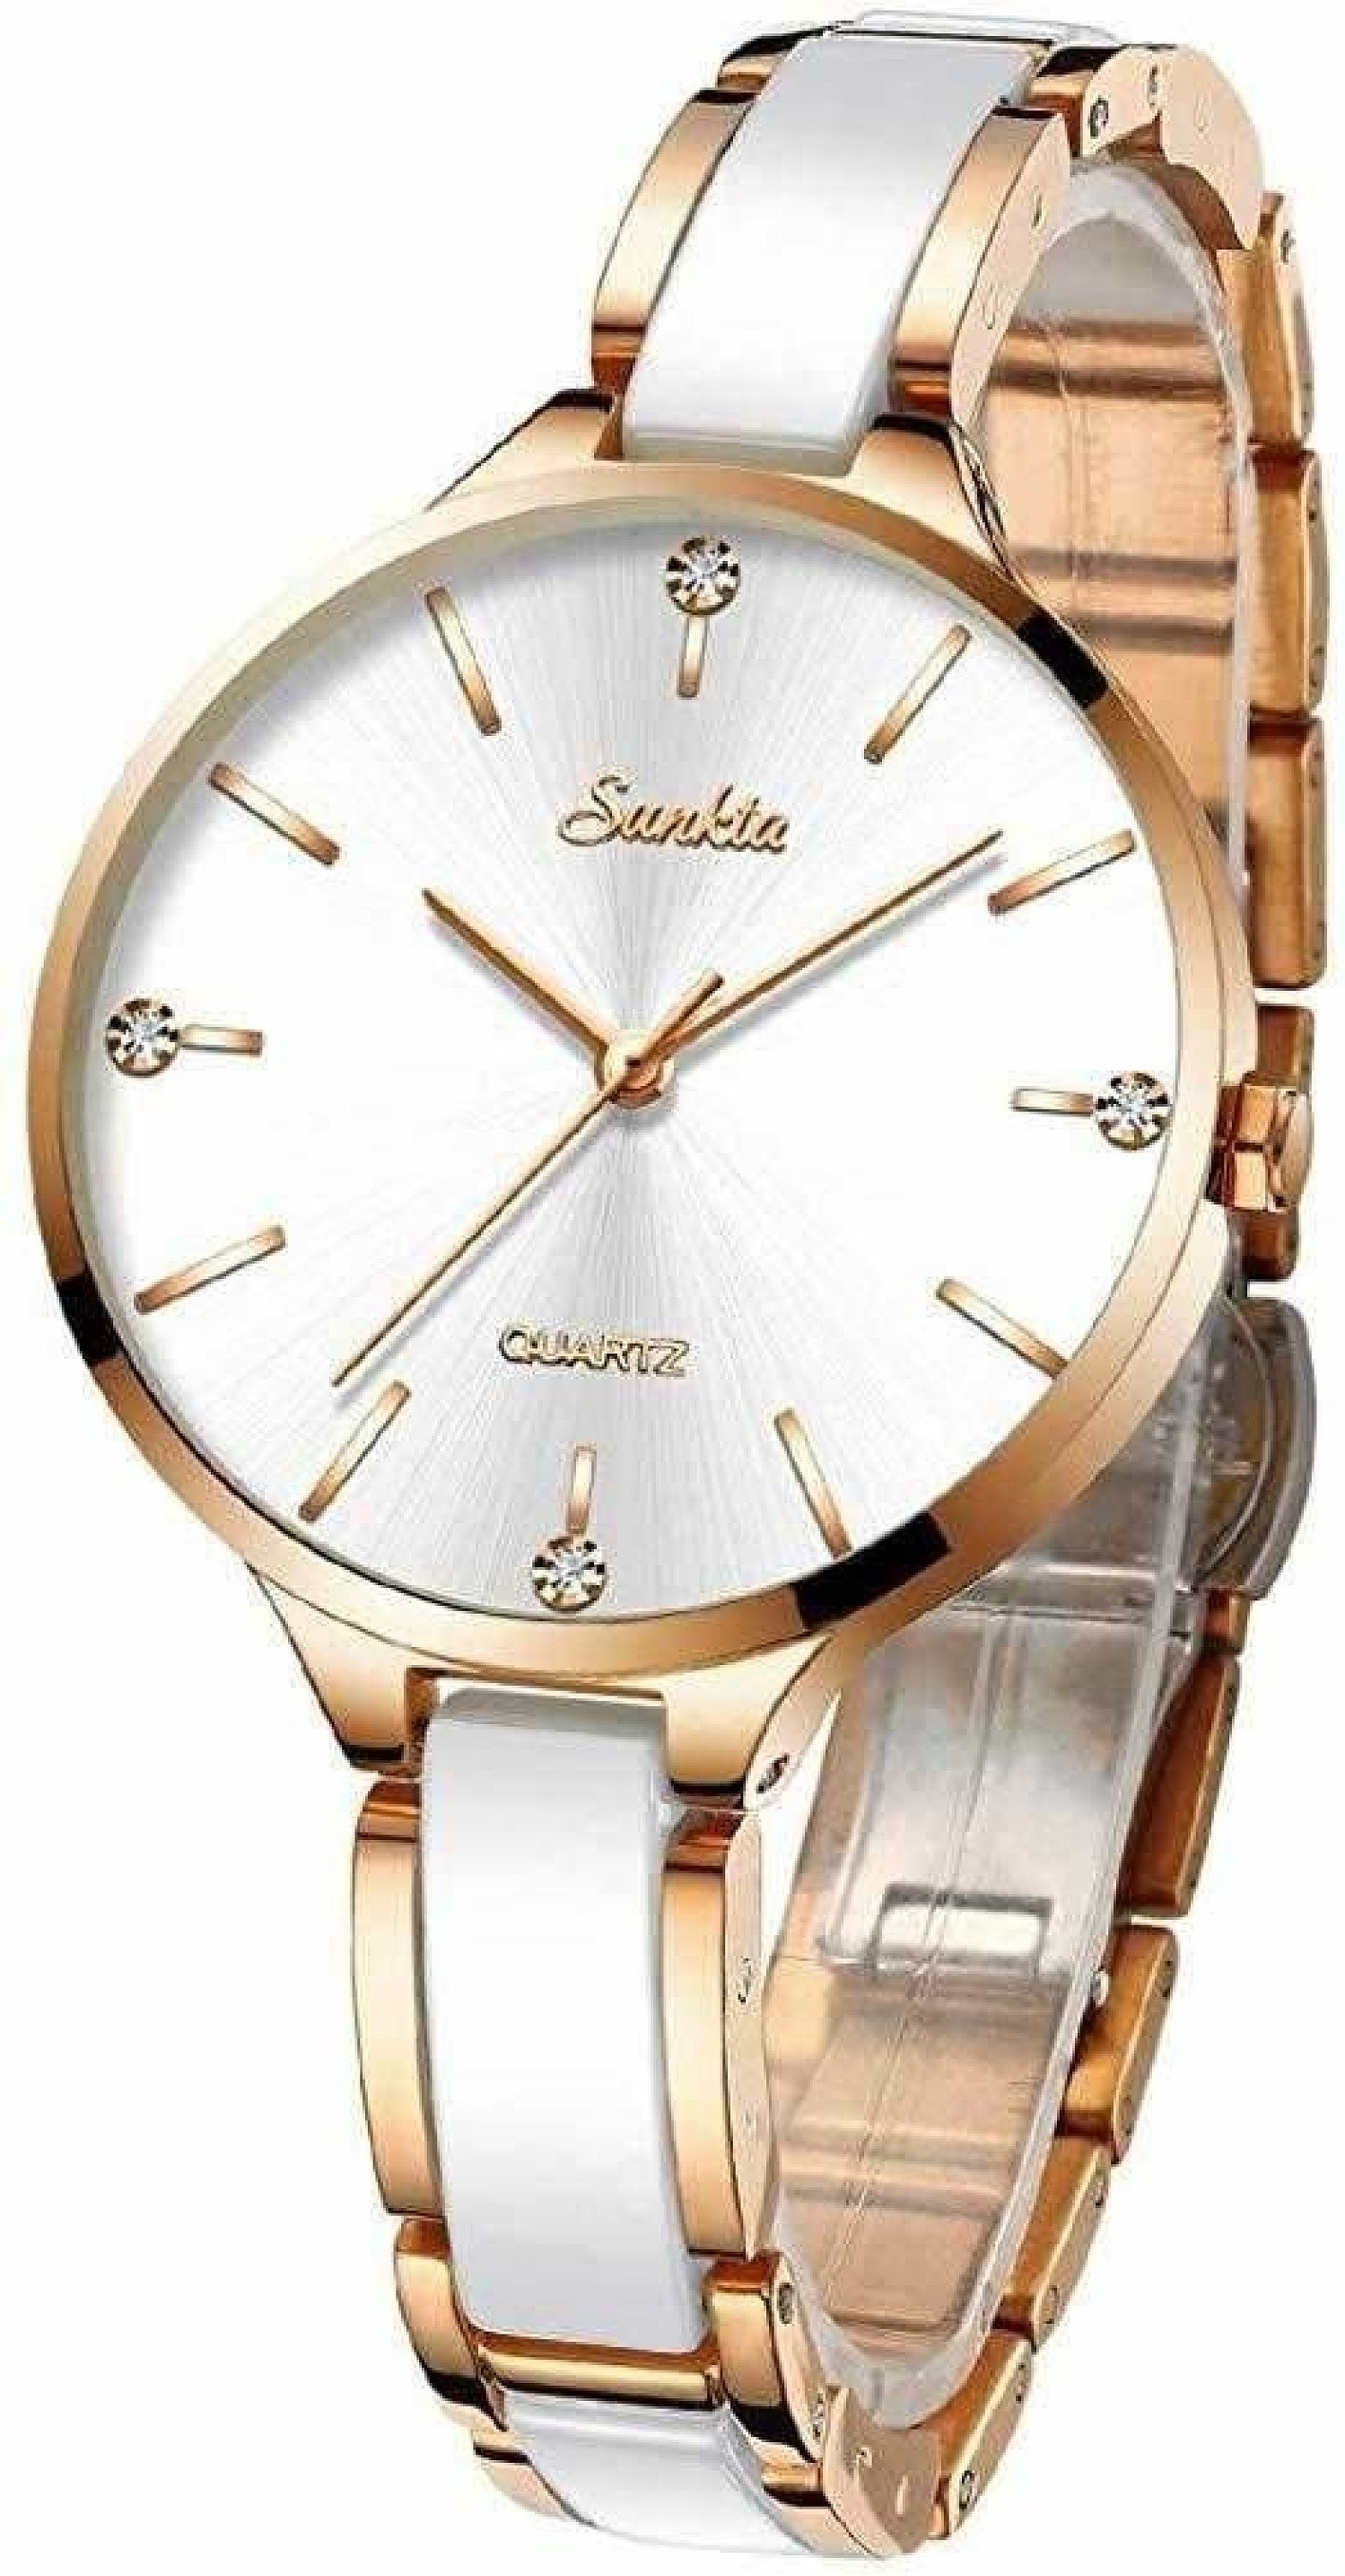 SUNKTA Womens Watches Waterproof Analogue Quartz Rose Gold Ceramics Wrist Watch Ladies Fashion Watch